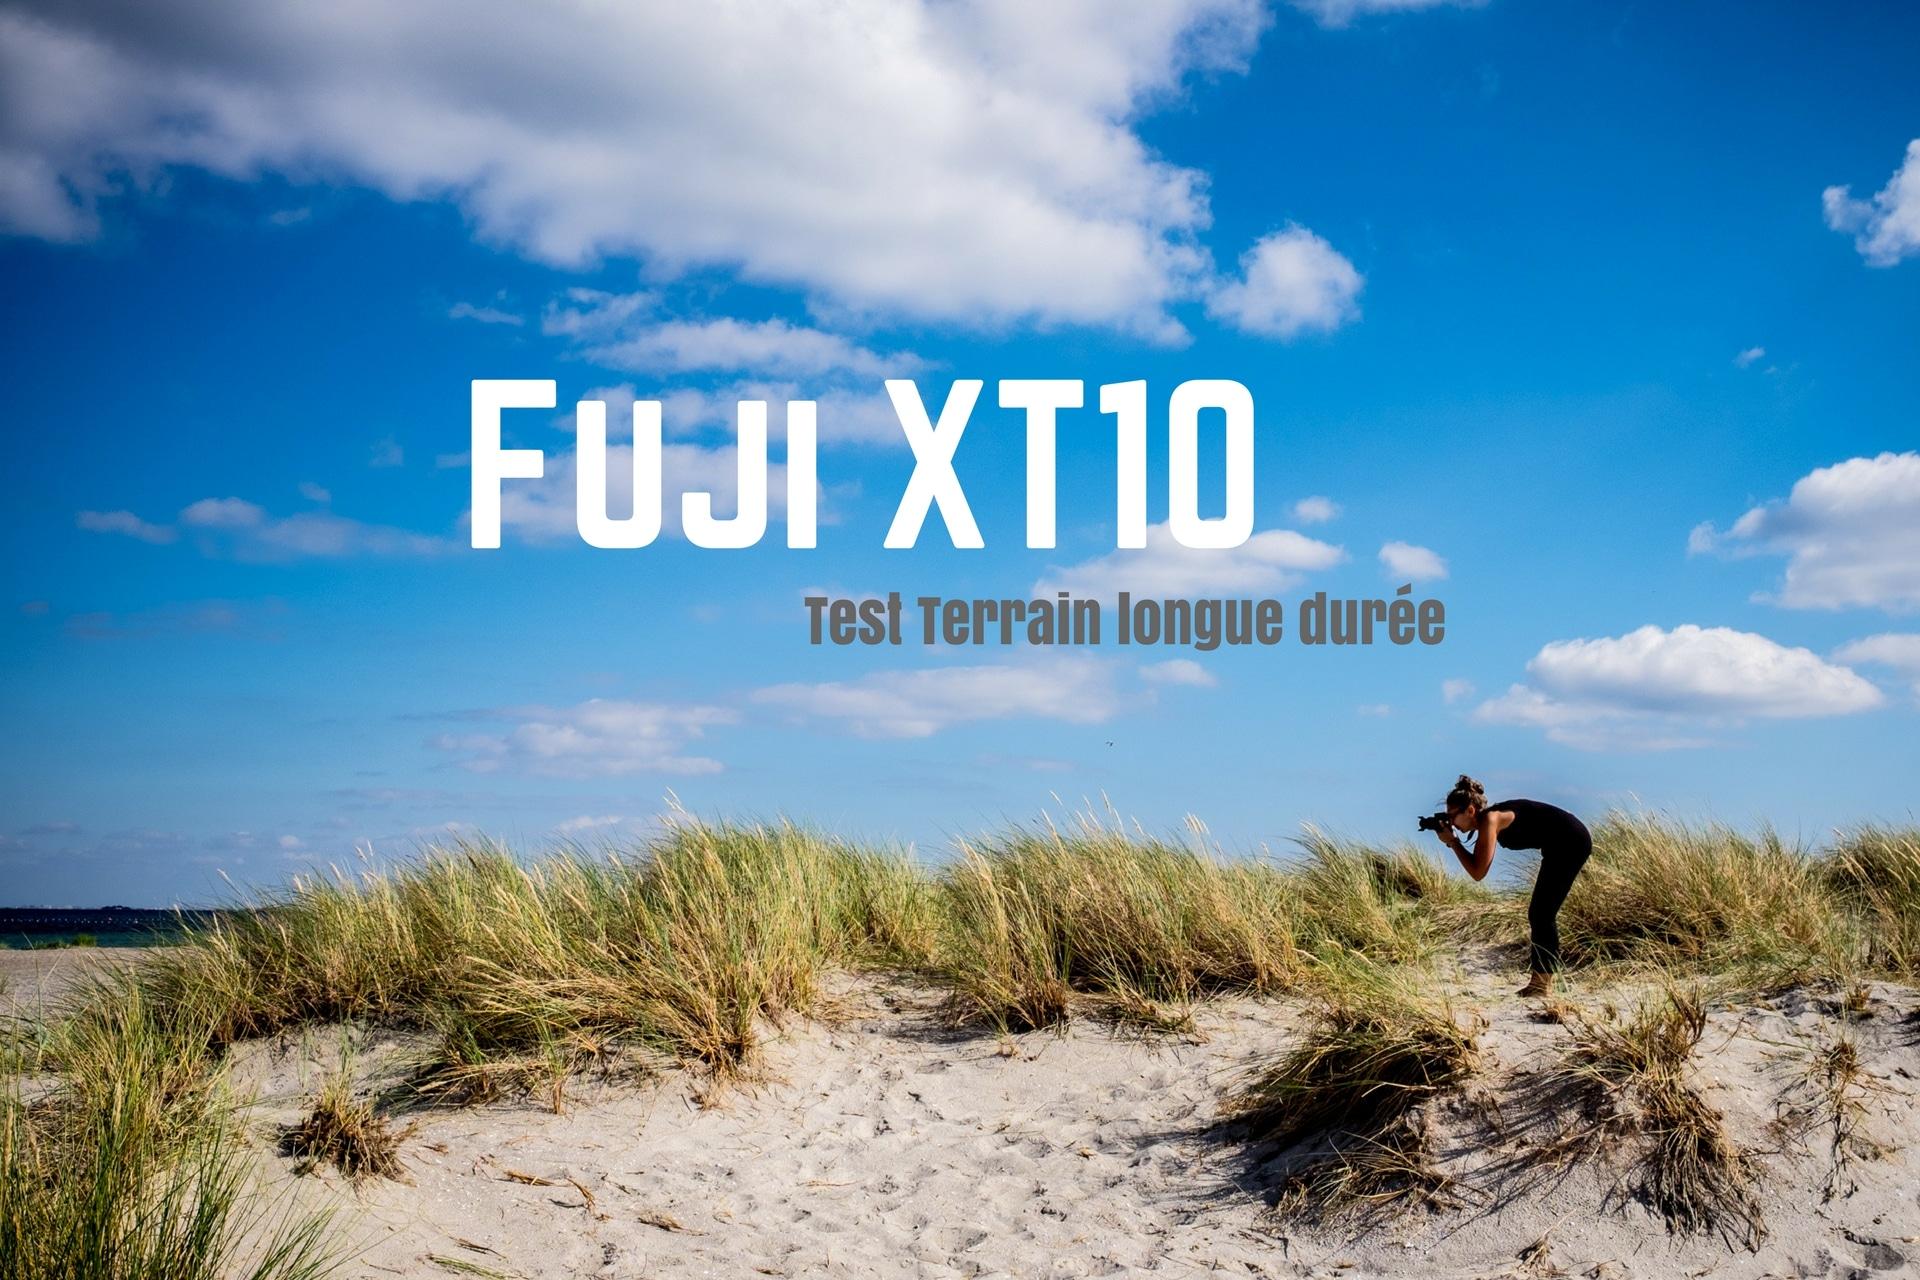 fujifilm xt10 test terrain longue dur e. Black Bedroom Furniture Sets. Home Design Ideas